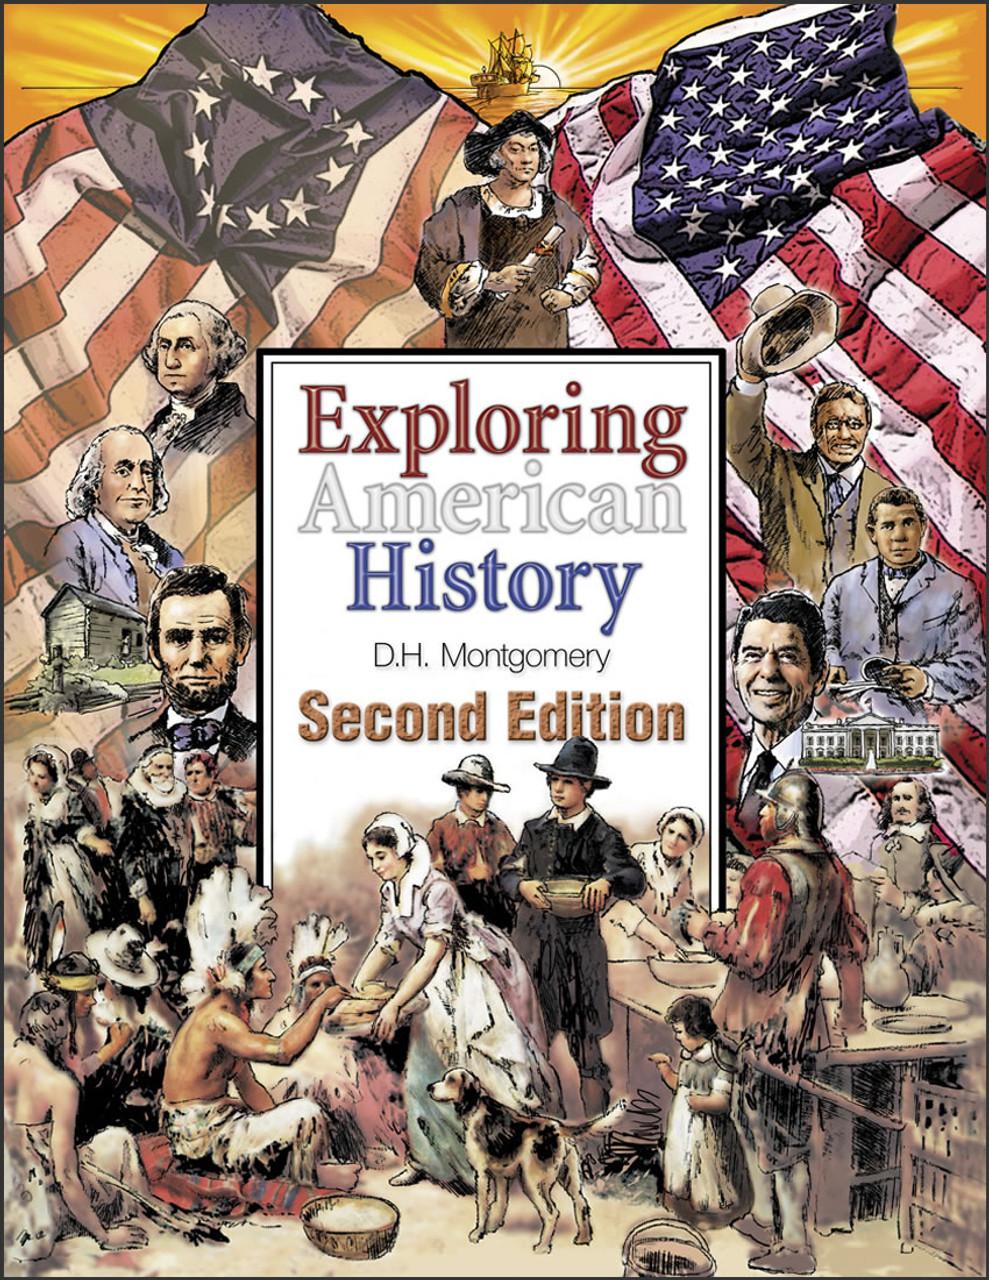 Exploring American History, 2nd edition